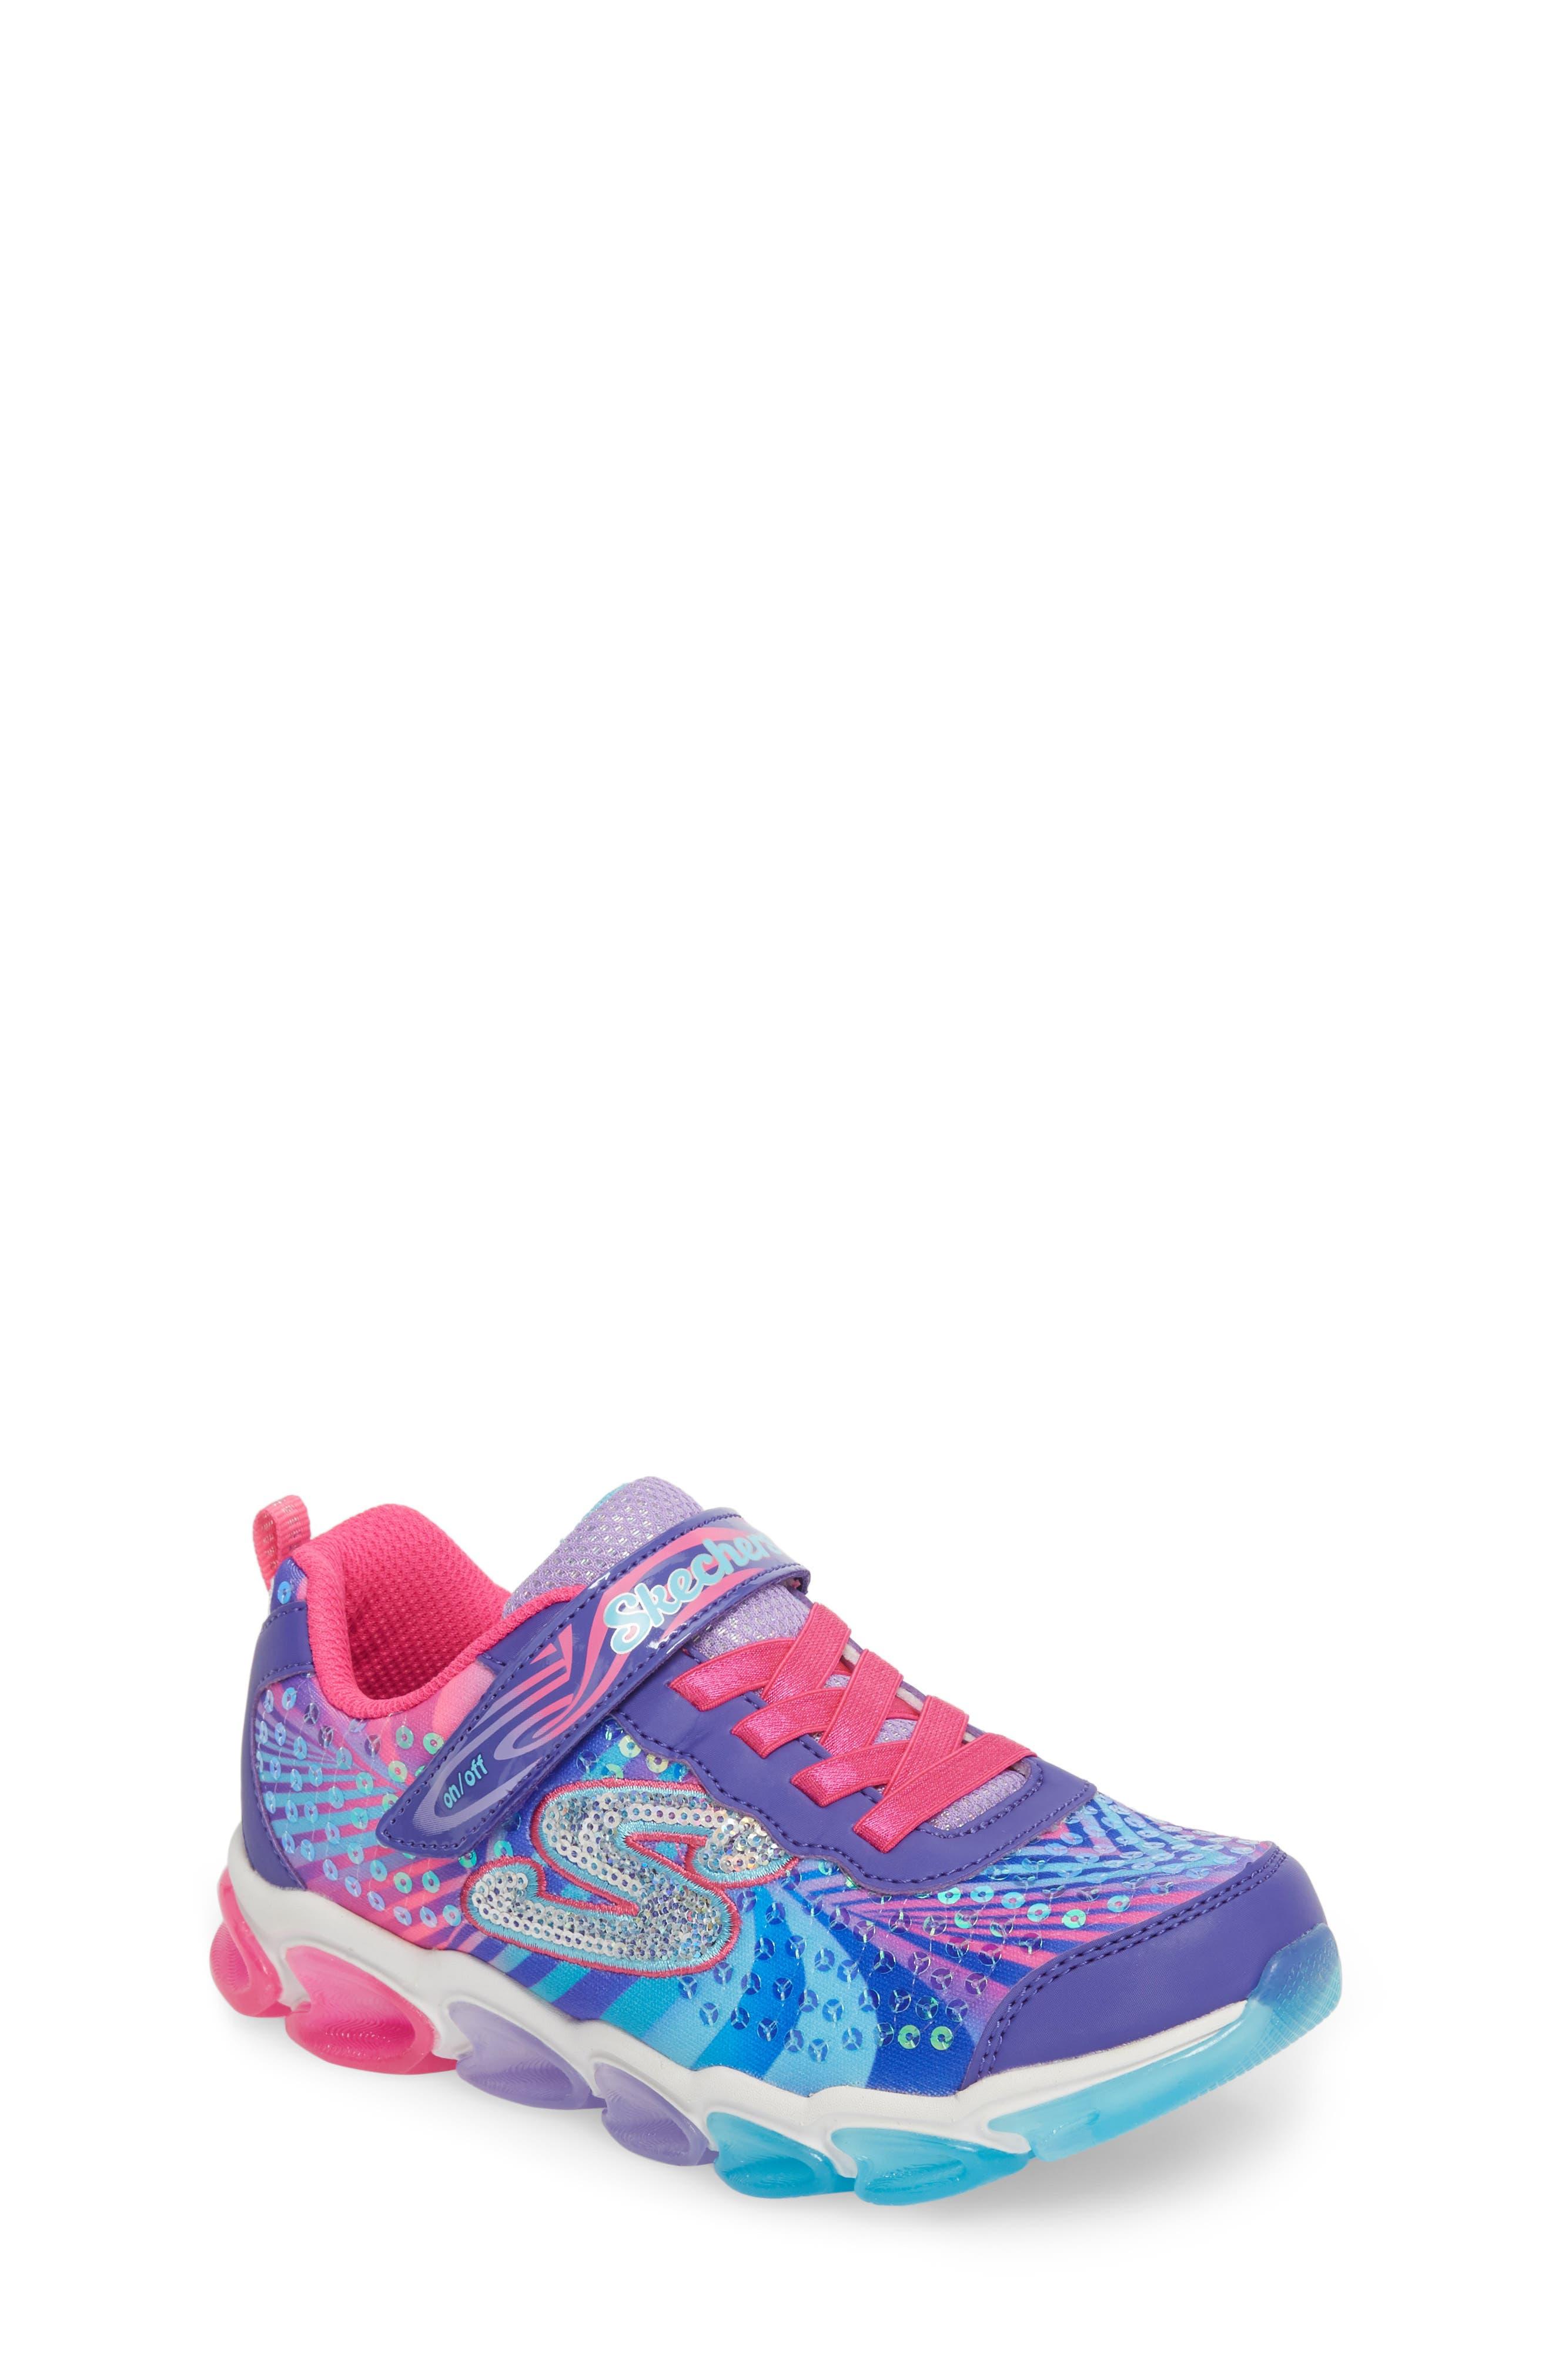 Jelly Beams Light-Up Sneaker,                         Main,                         color, Purple/ Multi